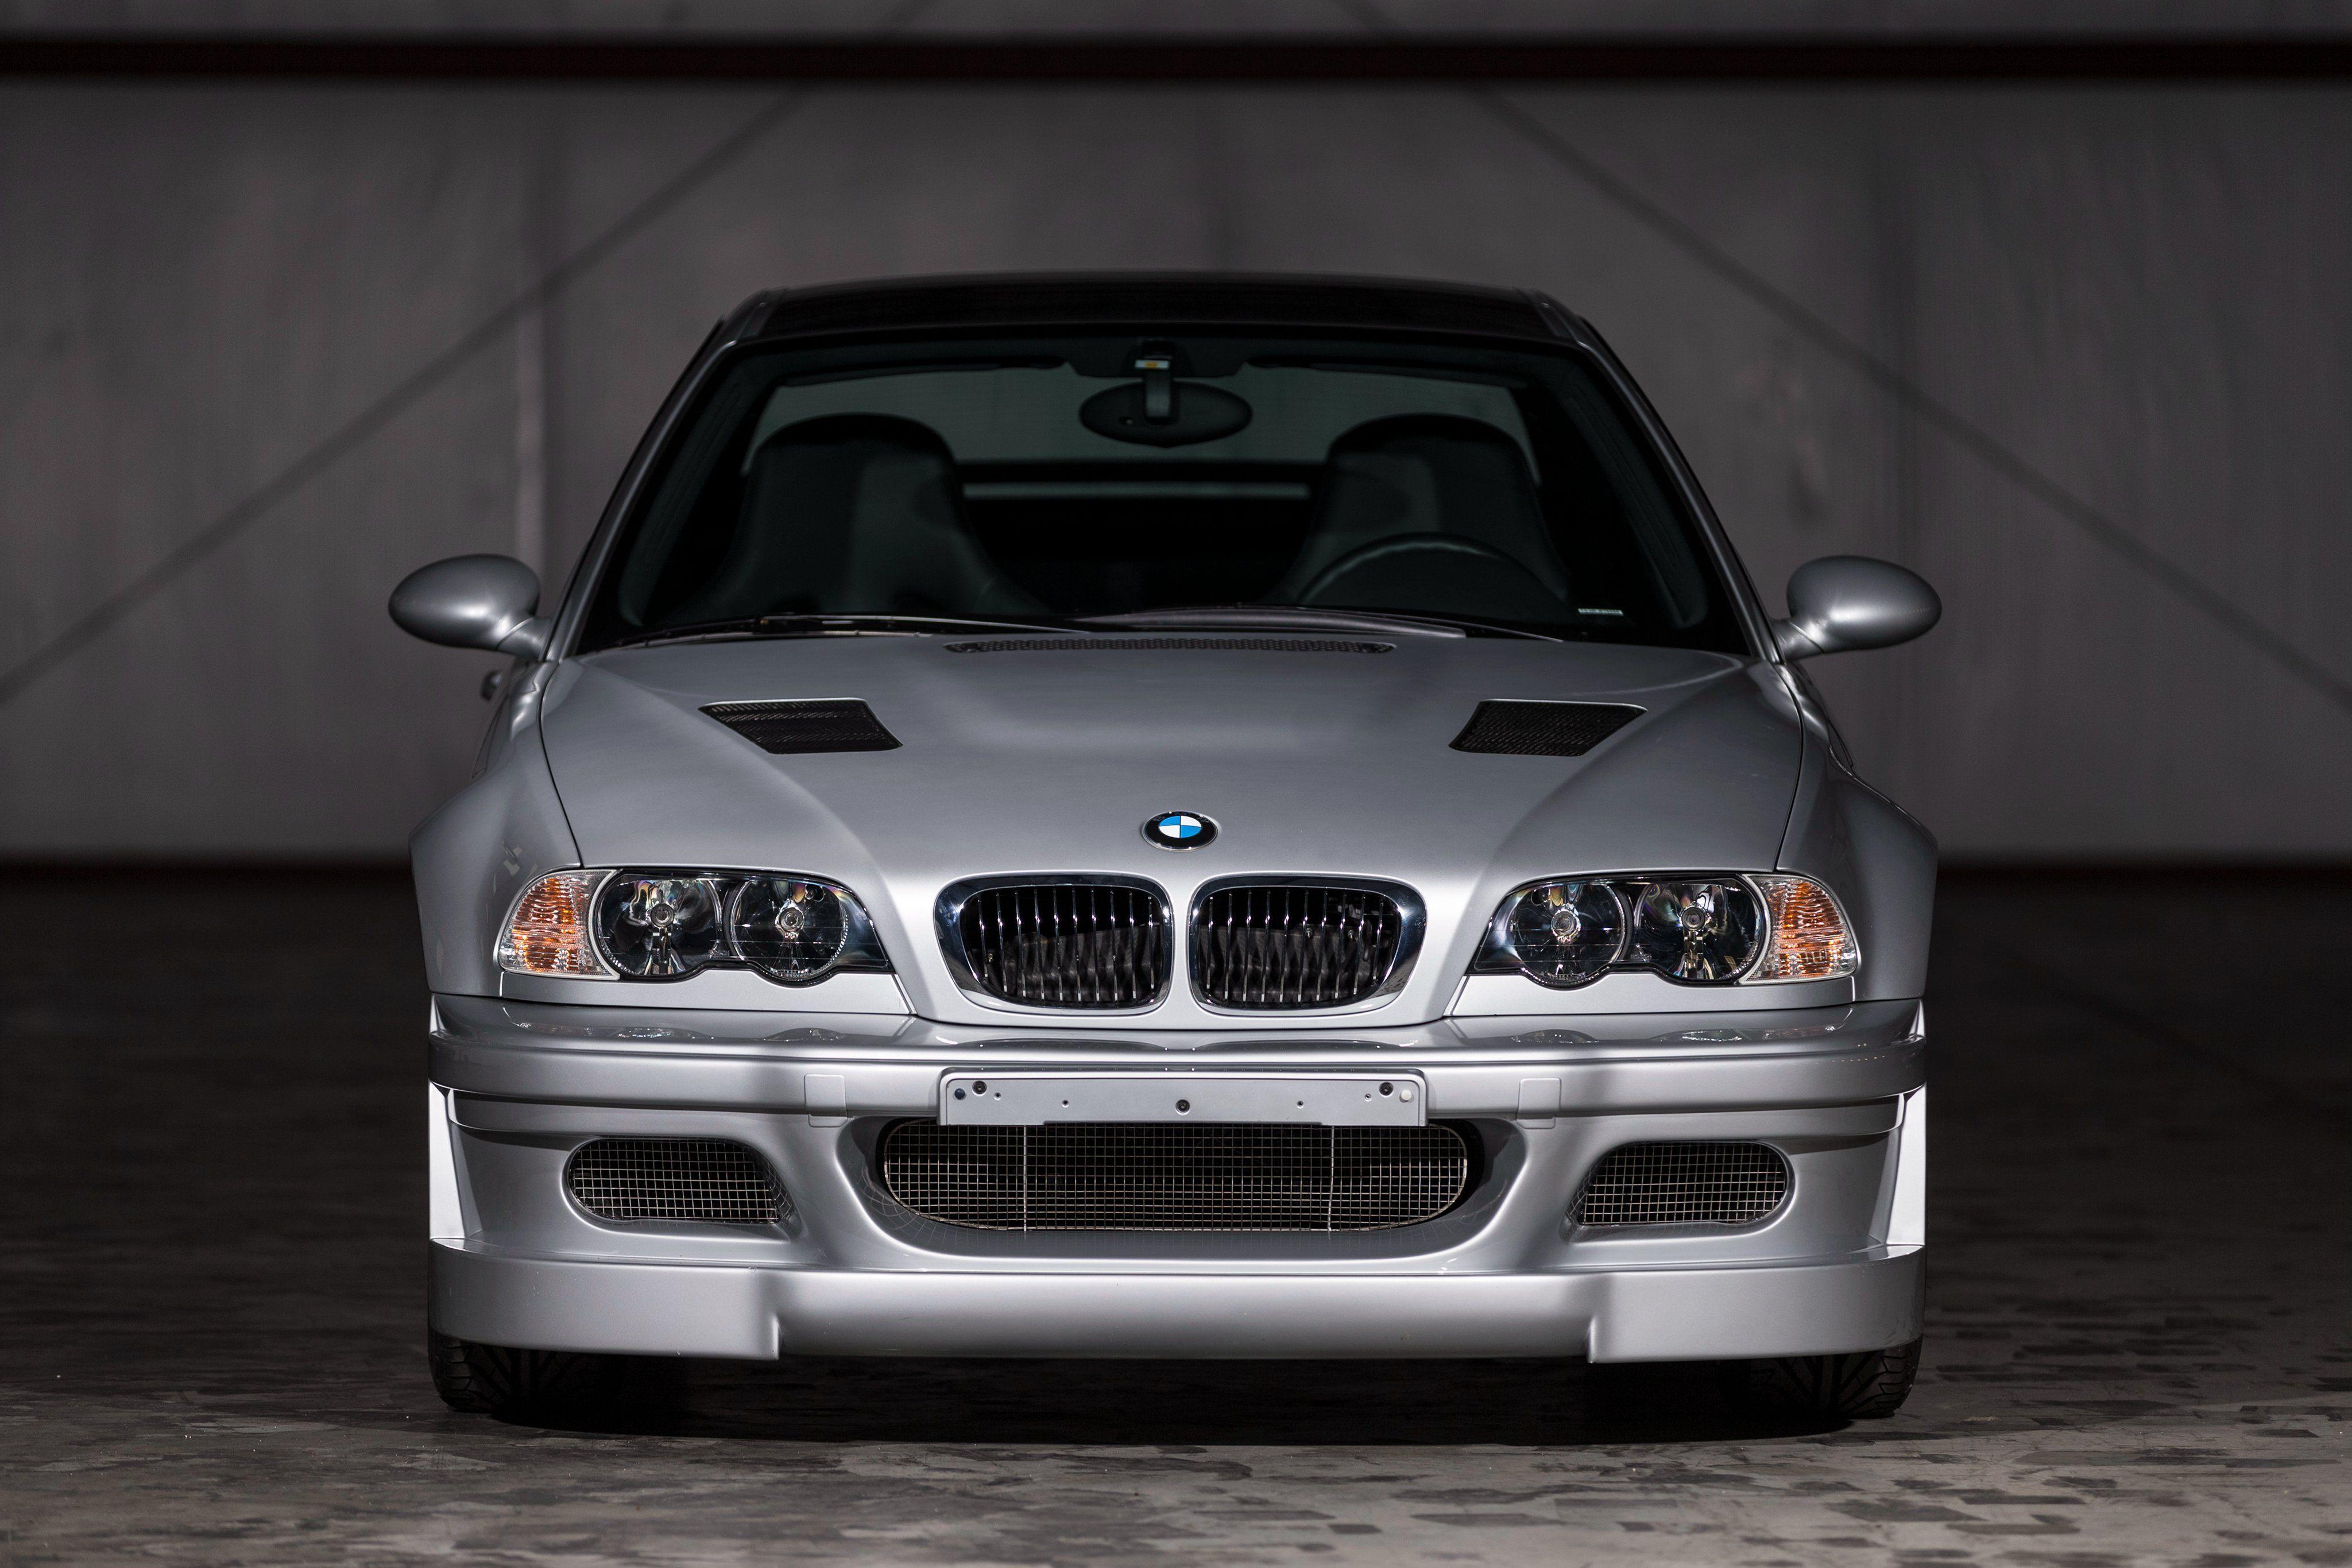 BMW E46 M3 GTR Wallpapers - Wallpaper Cave